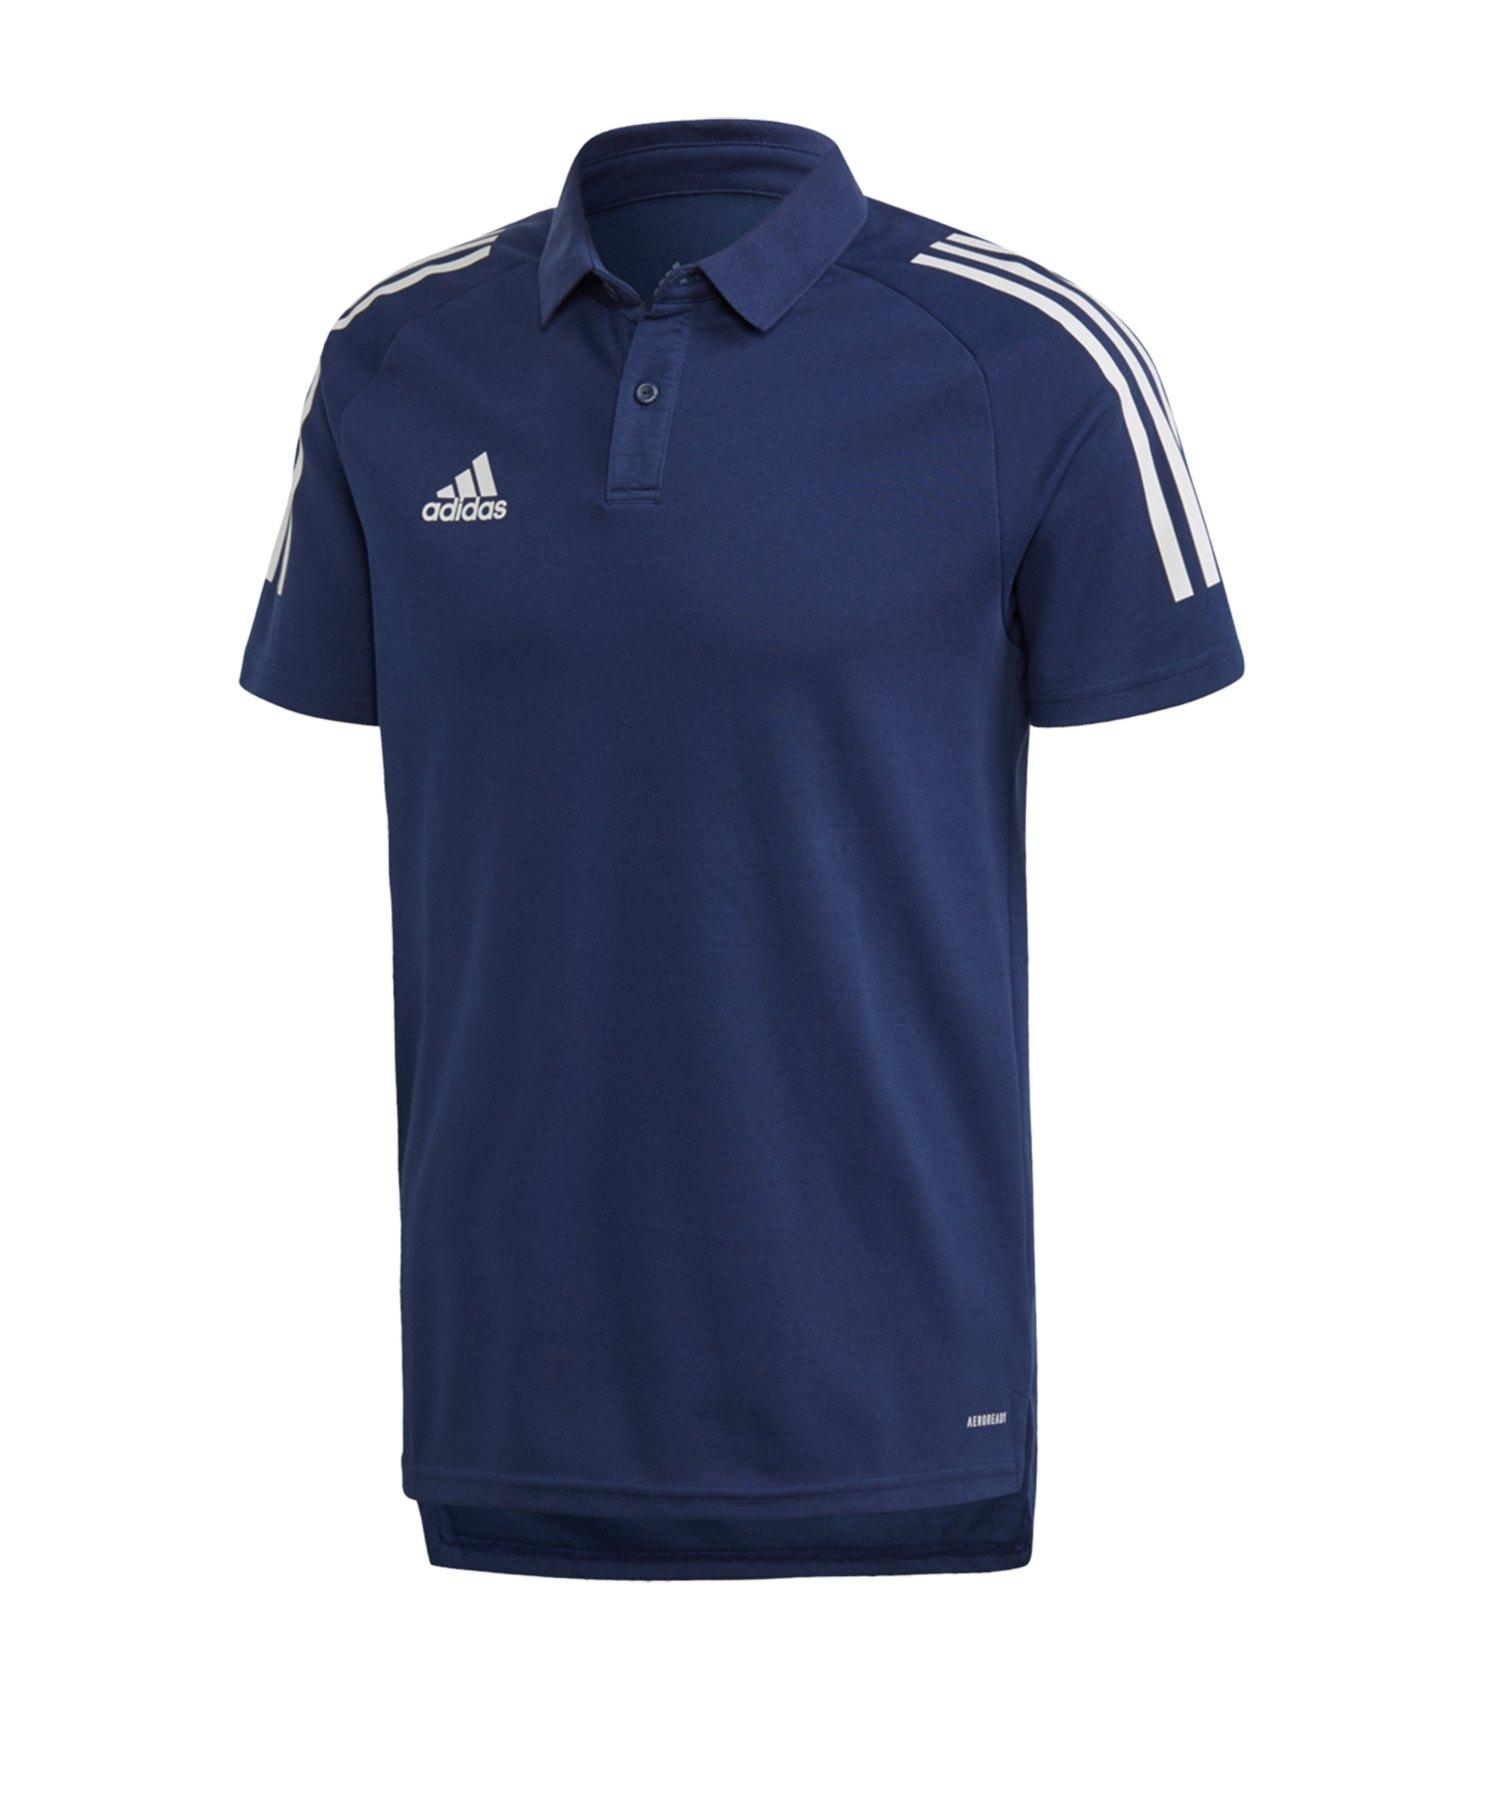 adidas Condivo 20 Poloshirt Dunkelblau Weiss - blau